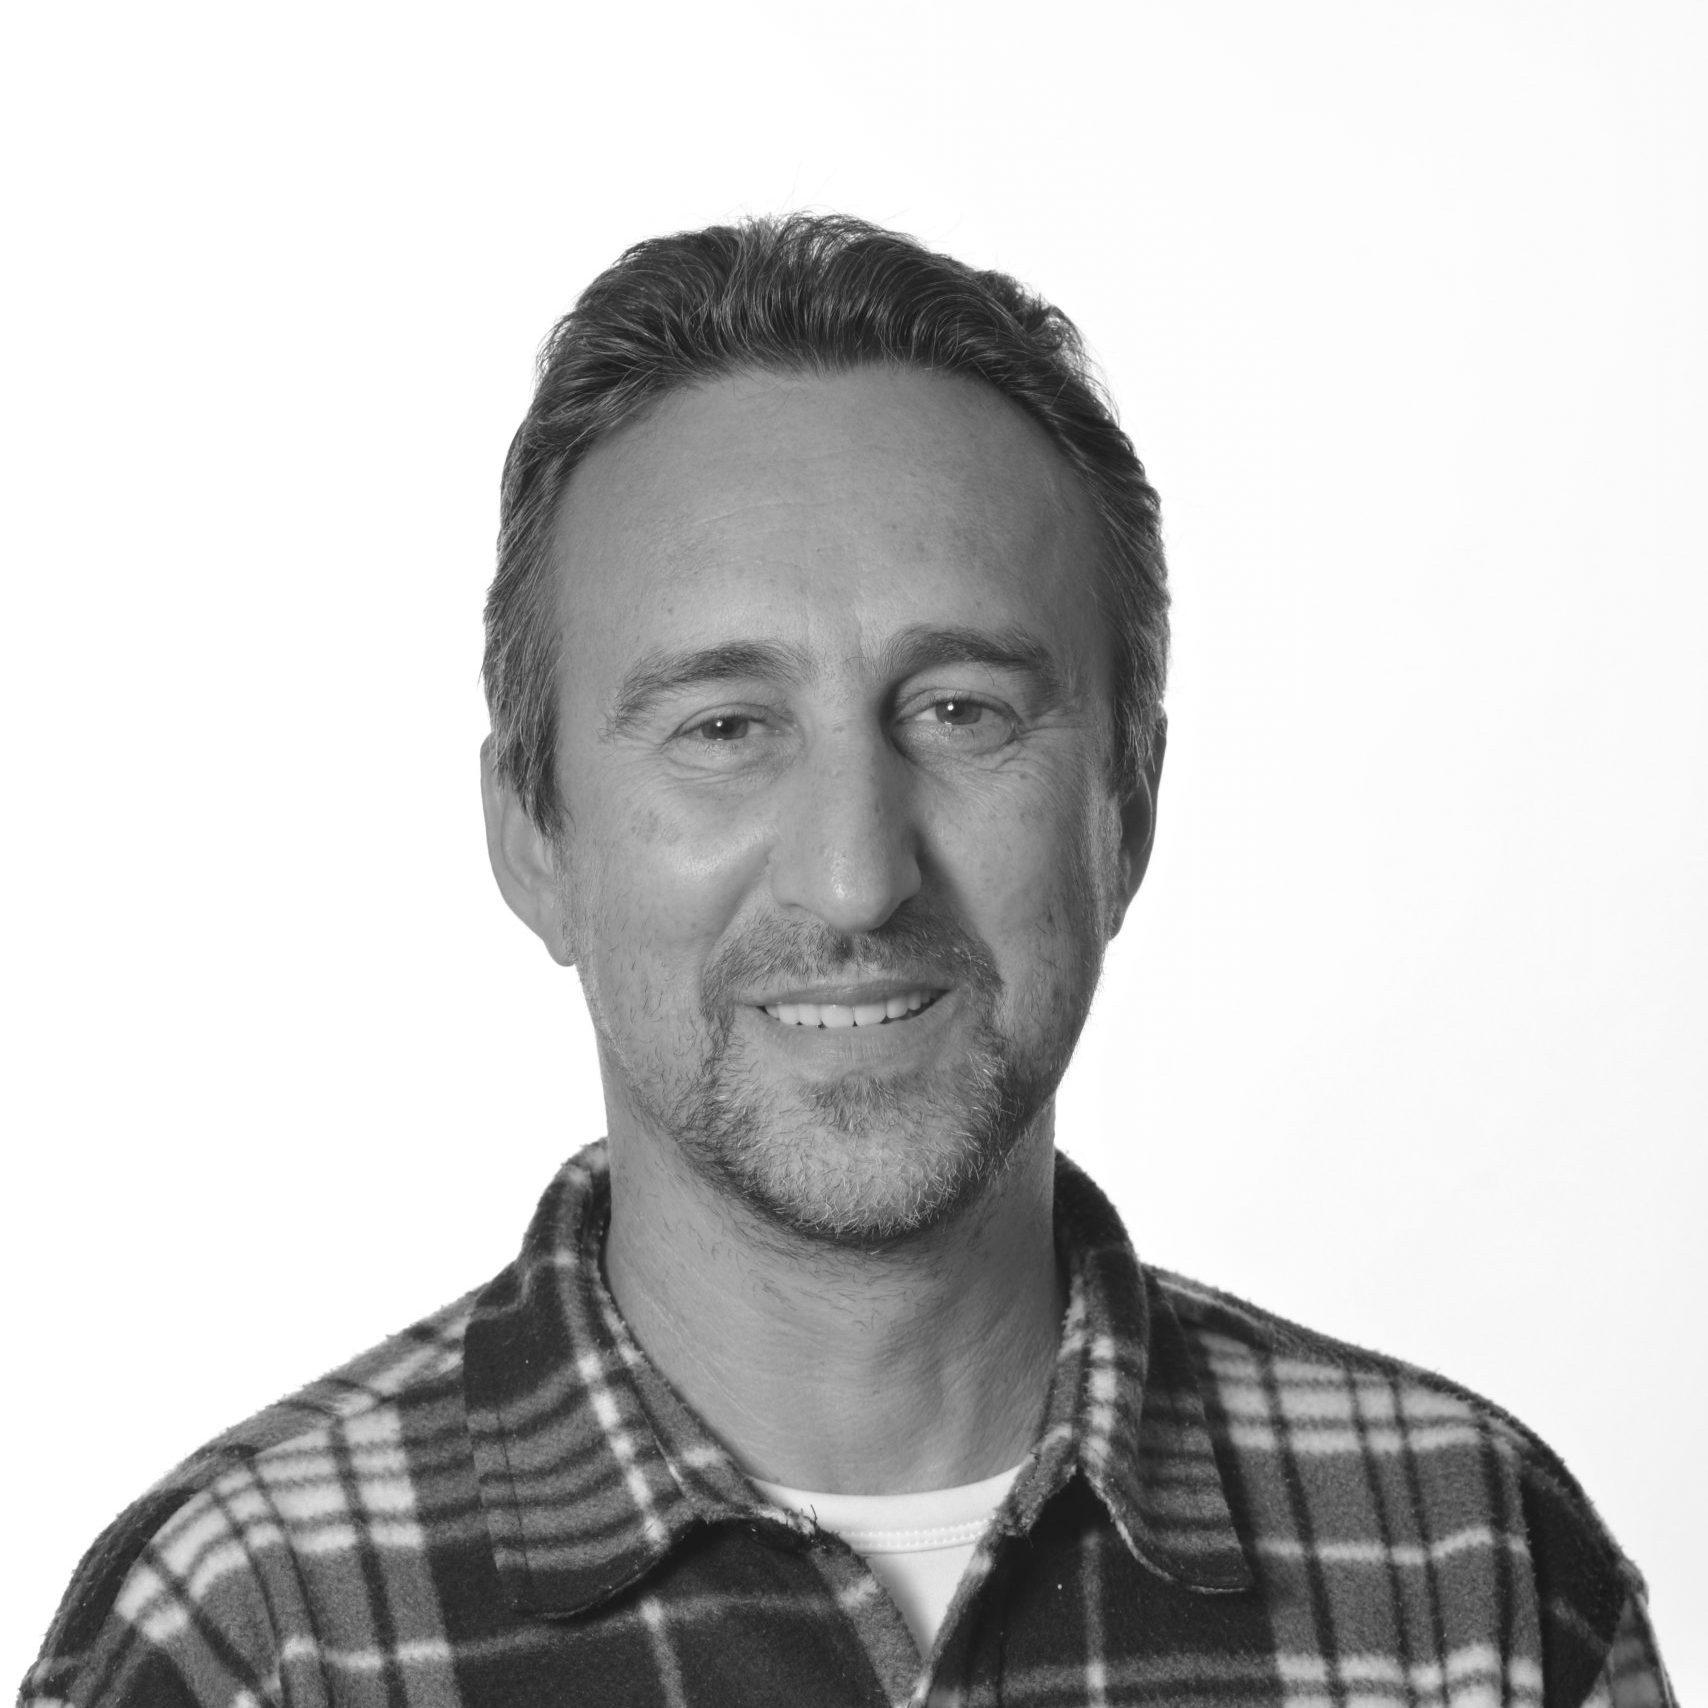 Carmi Gutman